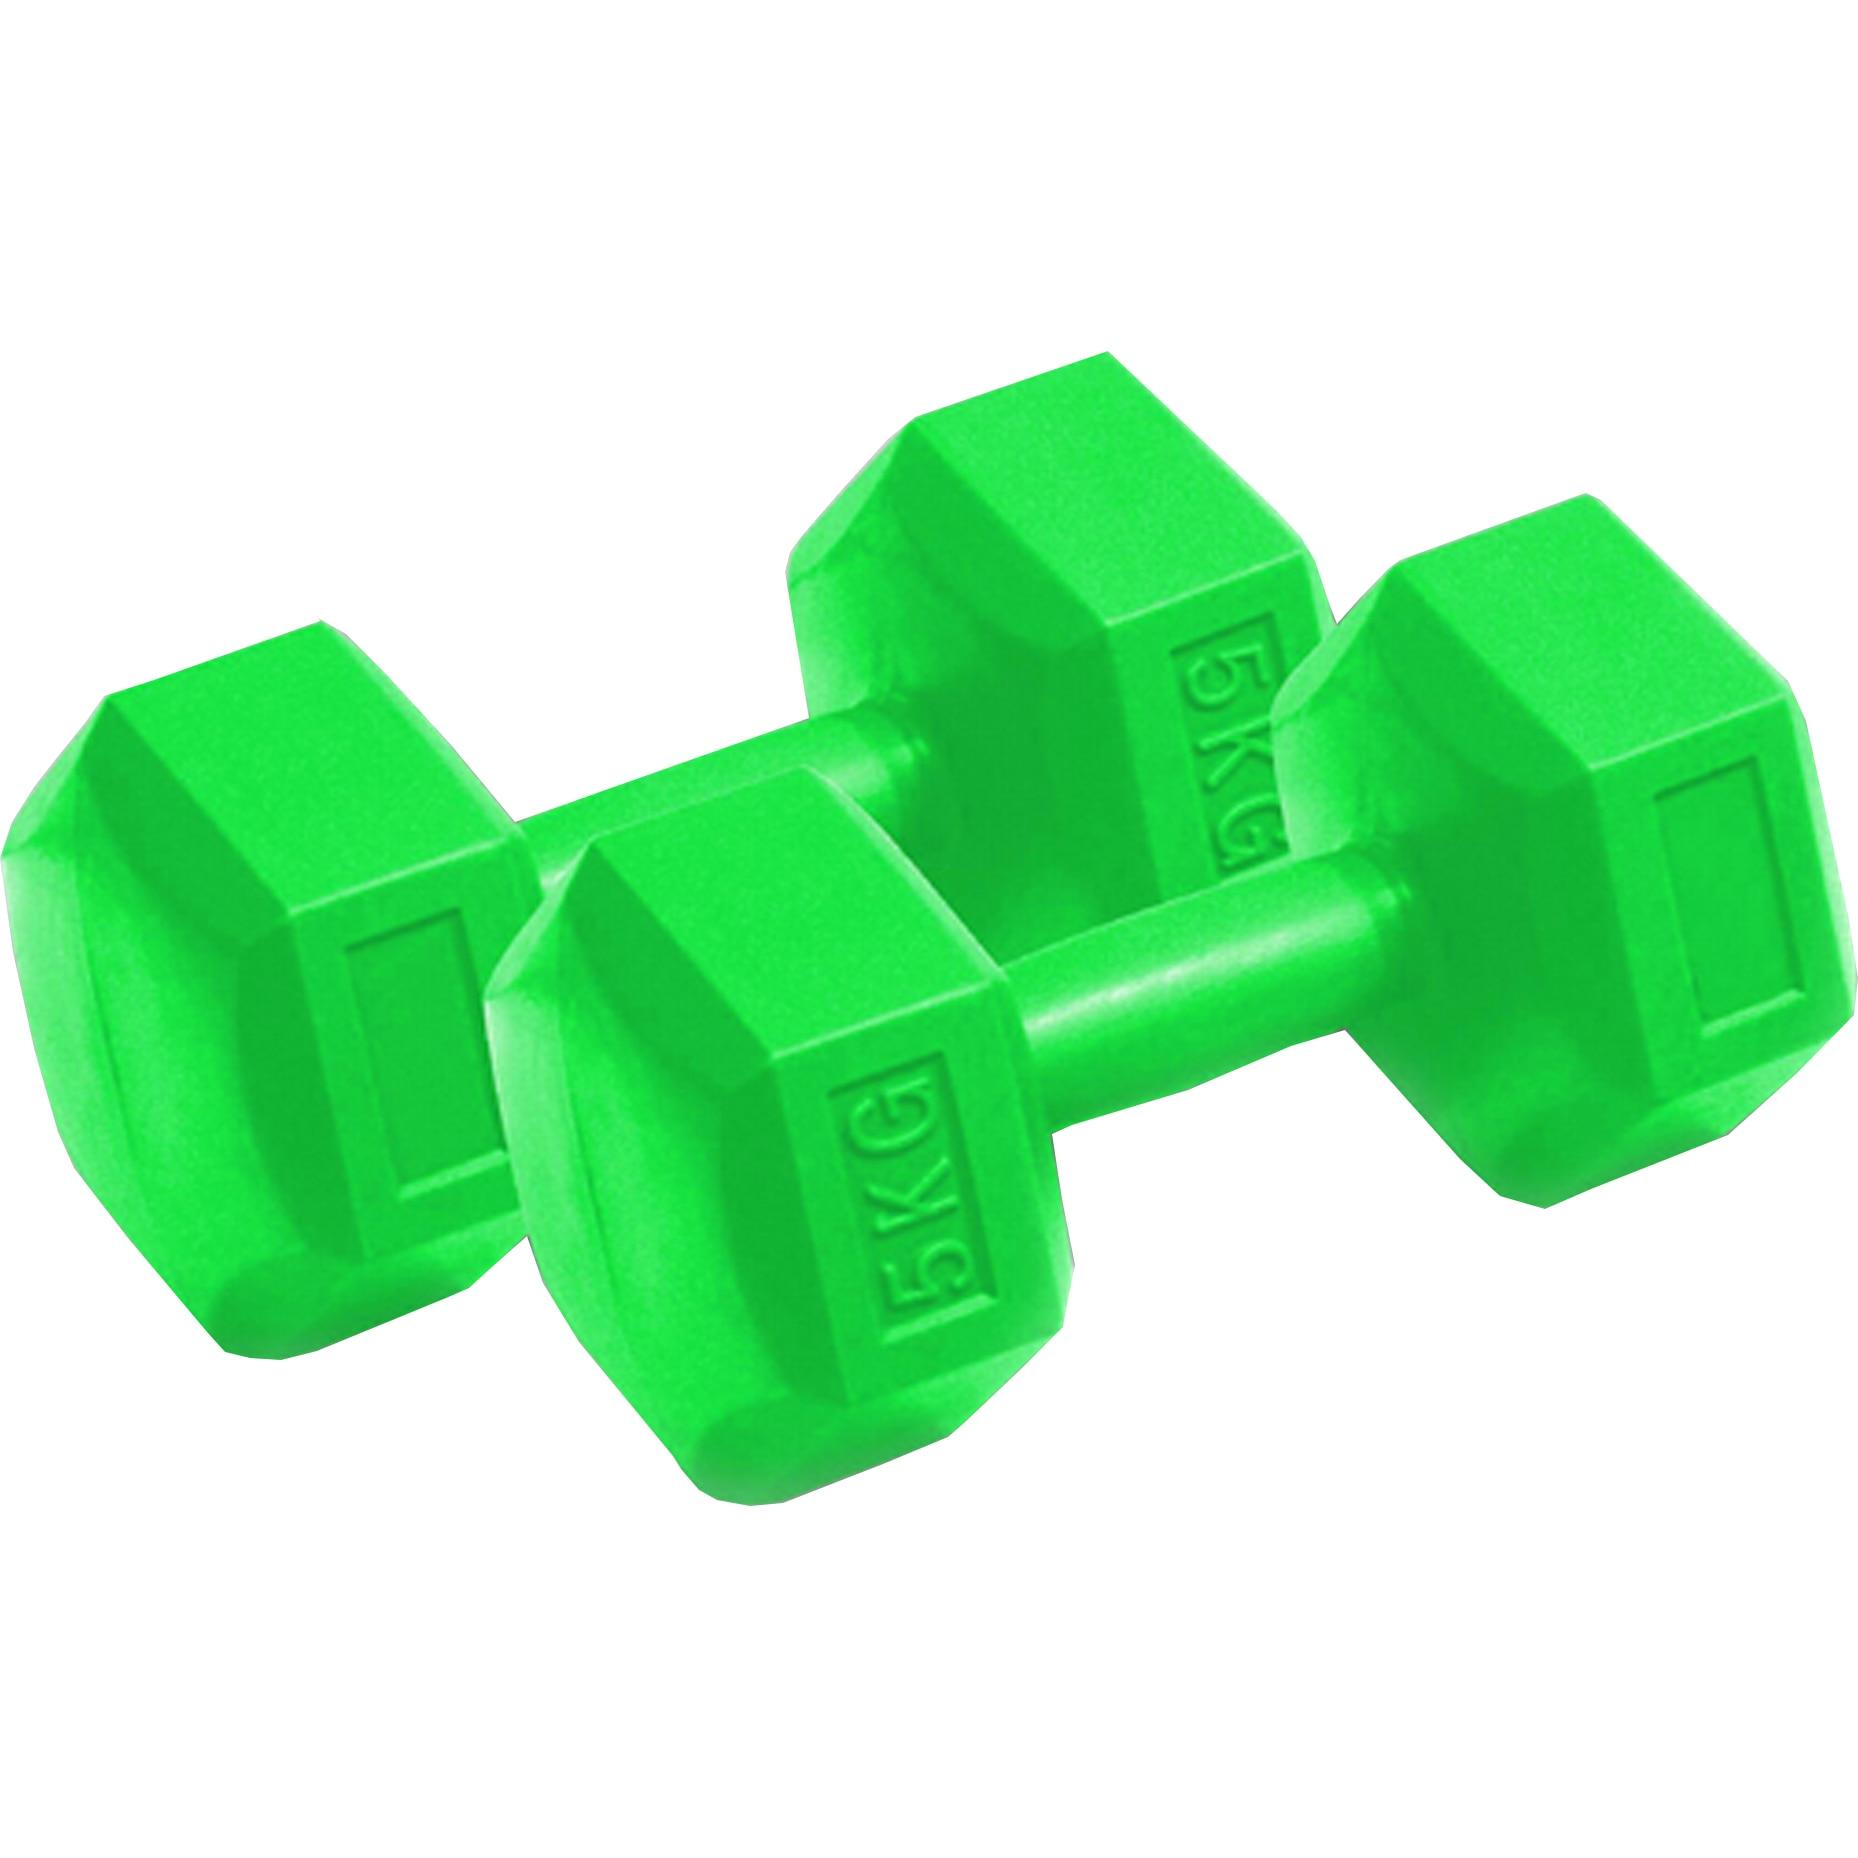 Fotografie Set de 2 gantere fitness Dynamic, coating plastic, 5 kg, culoare verde